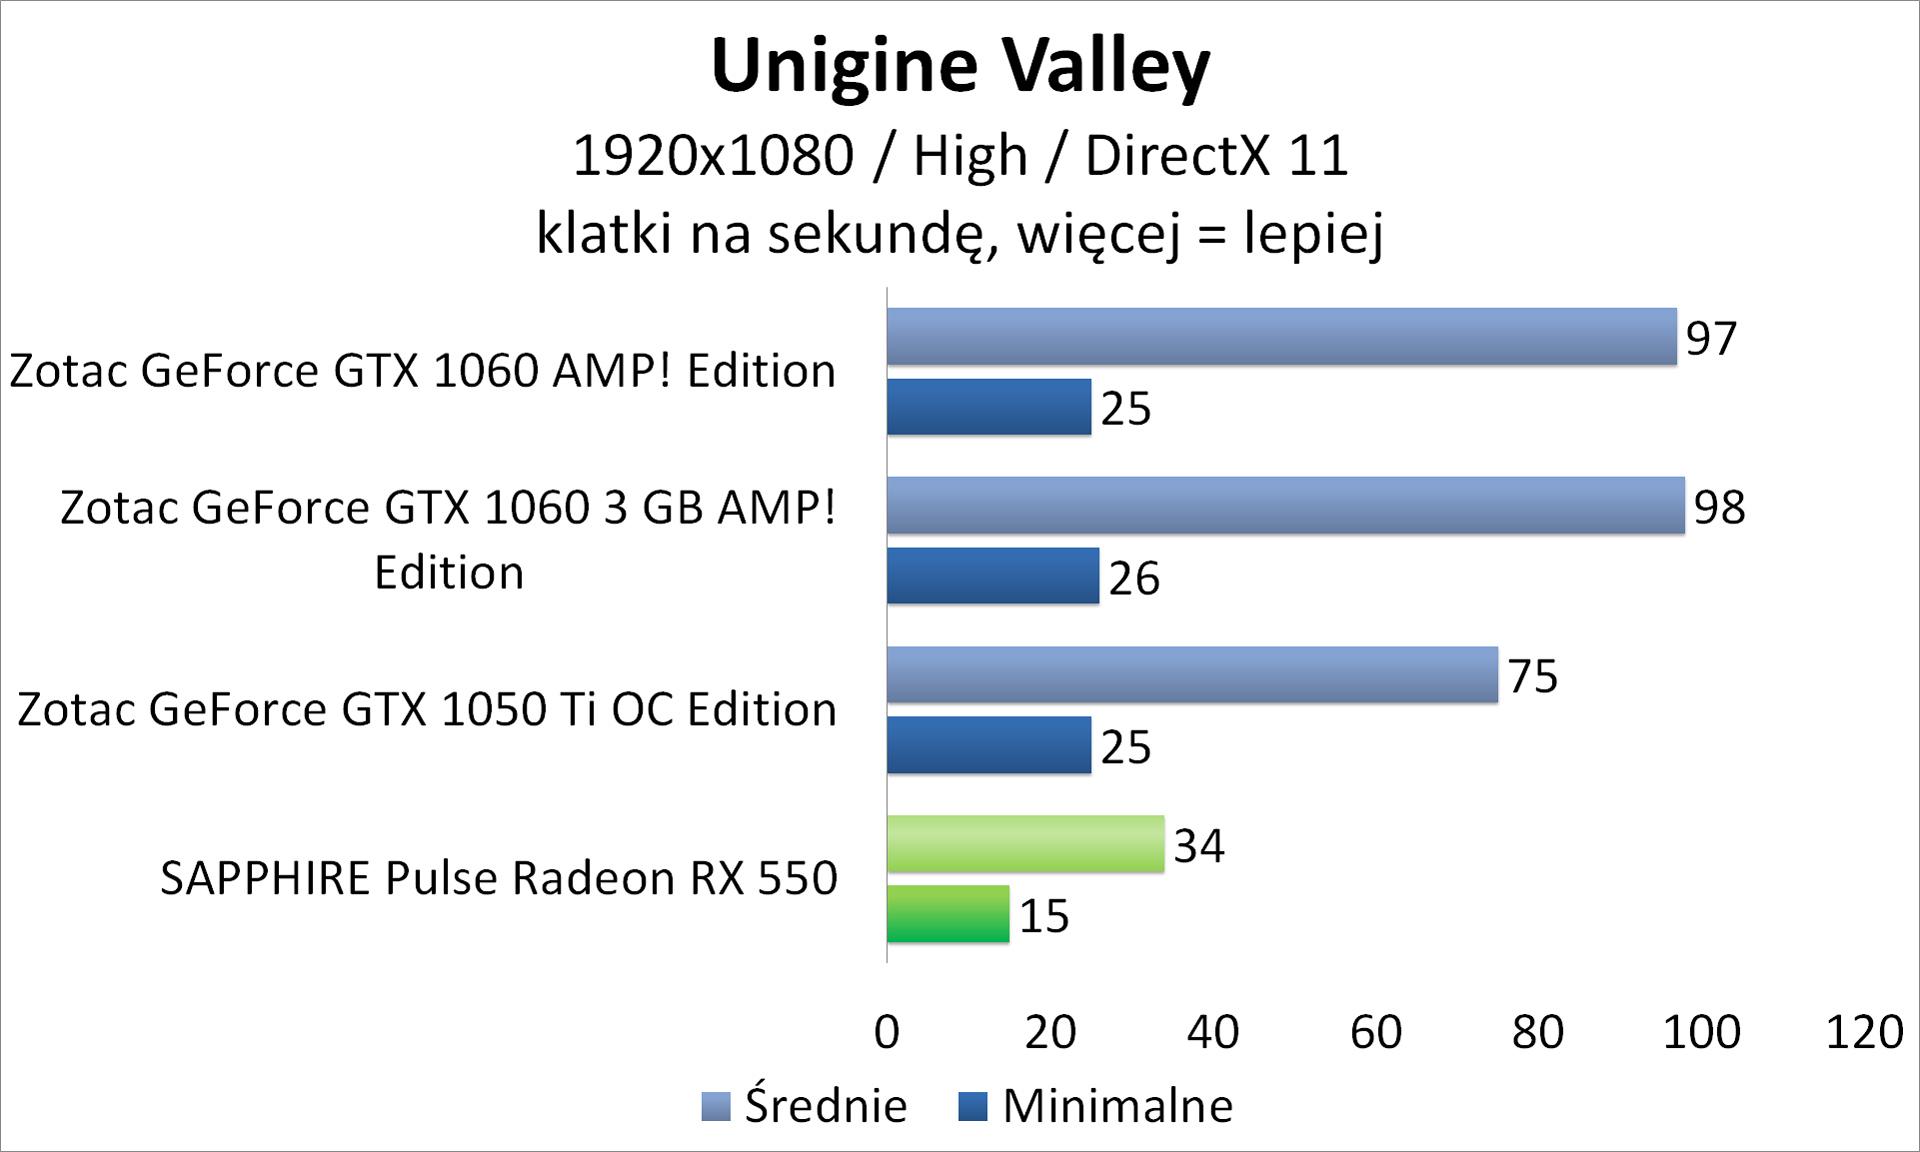 Sapphire PULSE Radeon RX 550 - mała, ale wydajna karta mini-ITX